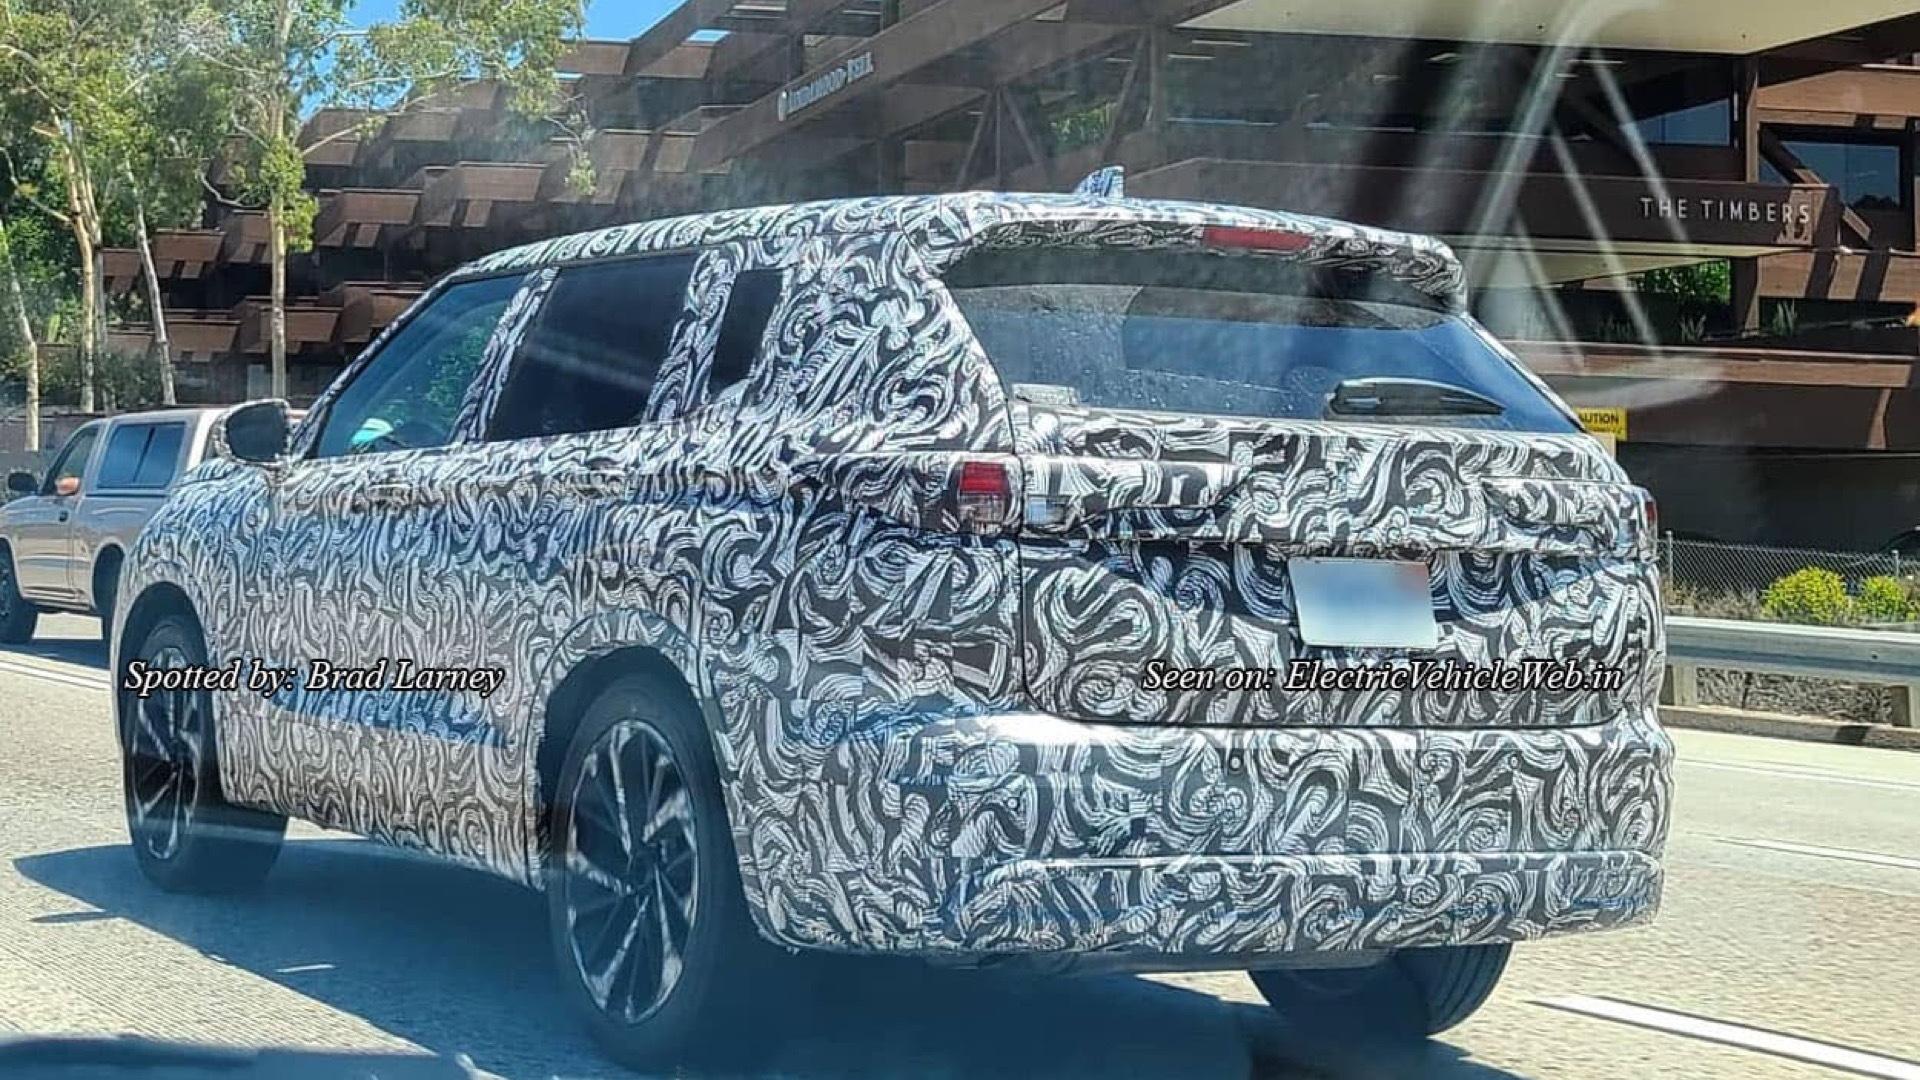 2021 Mitsubishi Outlander prototype  -  Brad Larney and Electric Vehicle Web